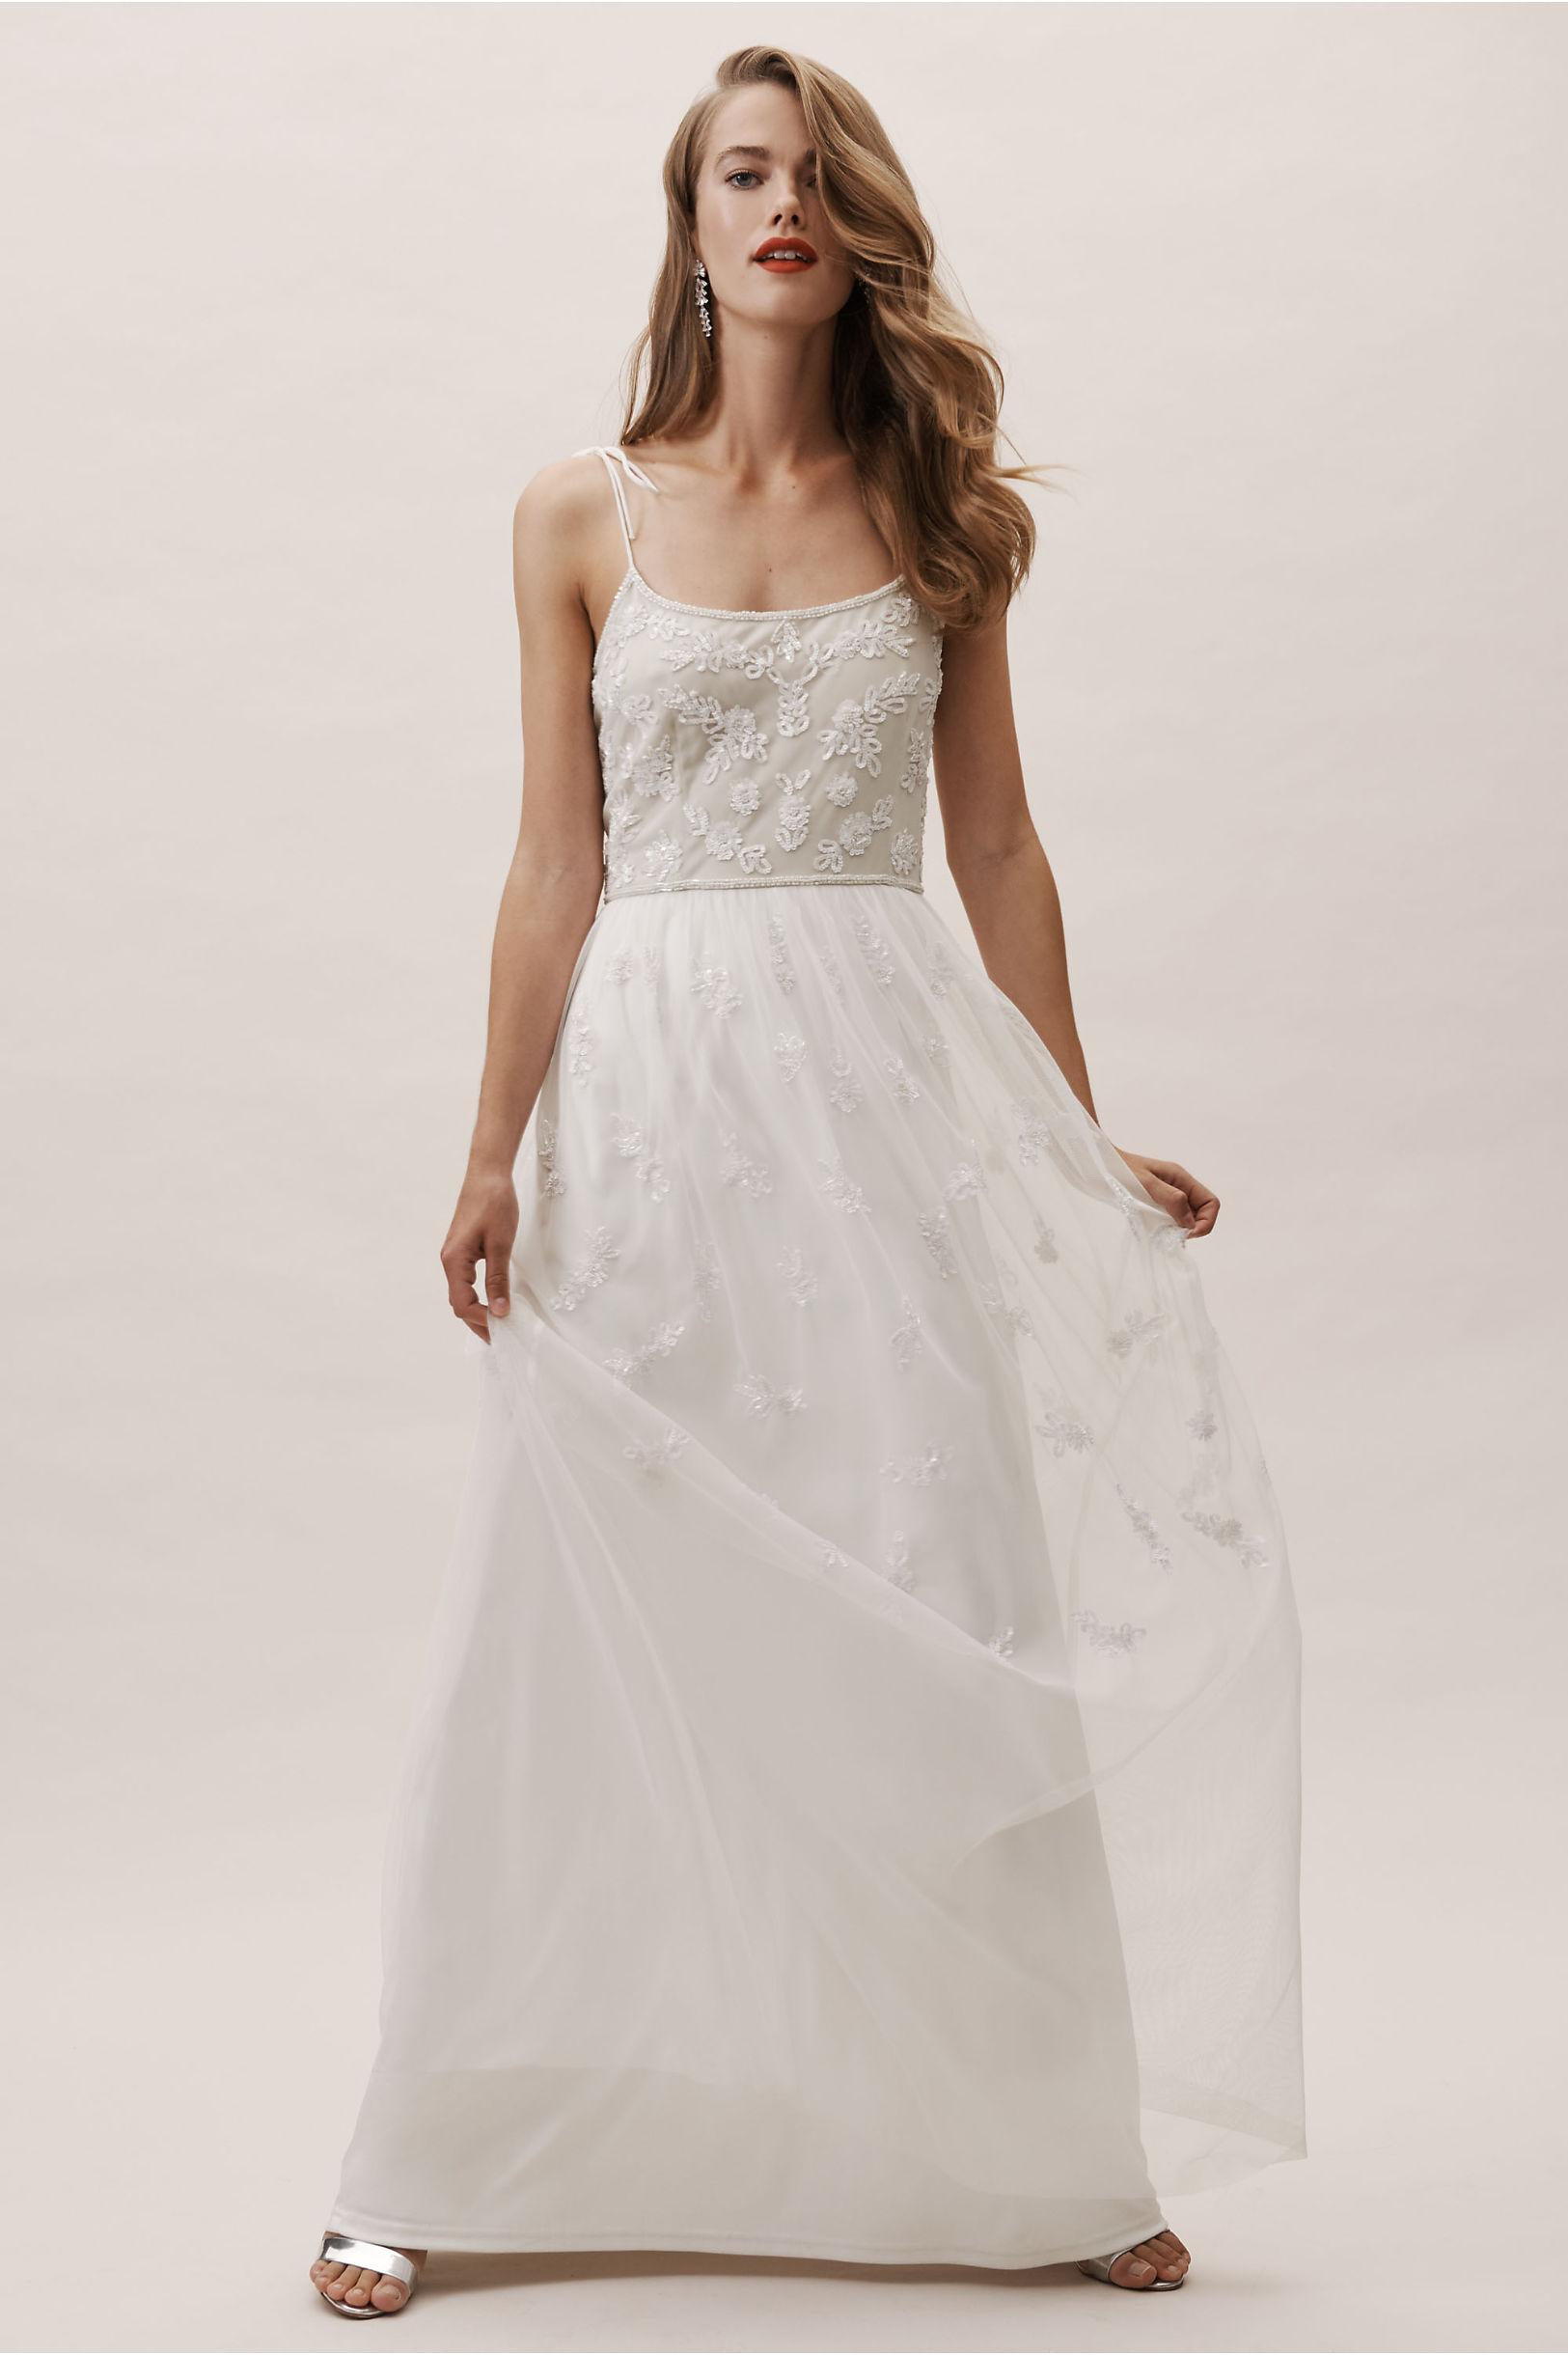 Marshall Dress Ivory/Nude in Bride   BHLDN